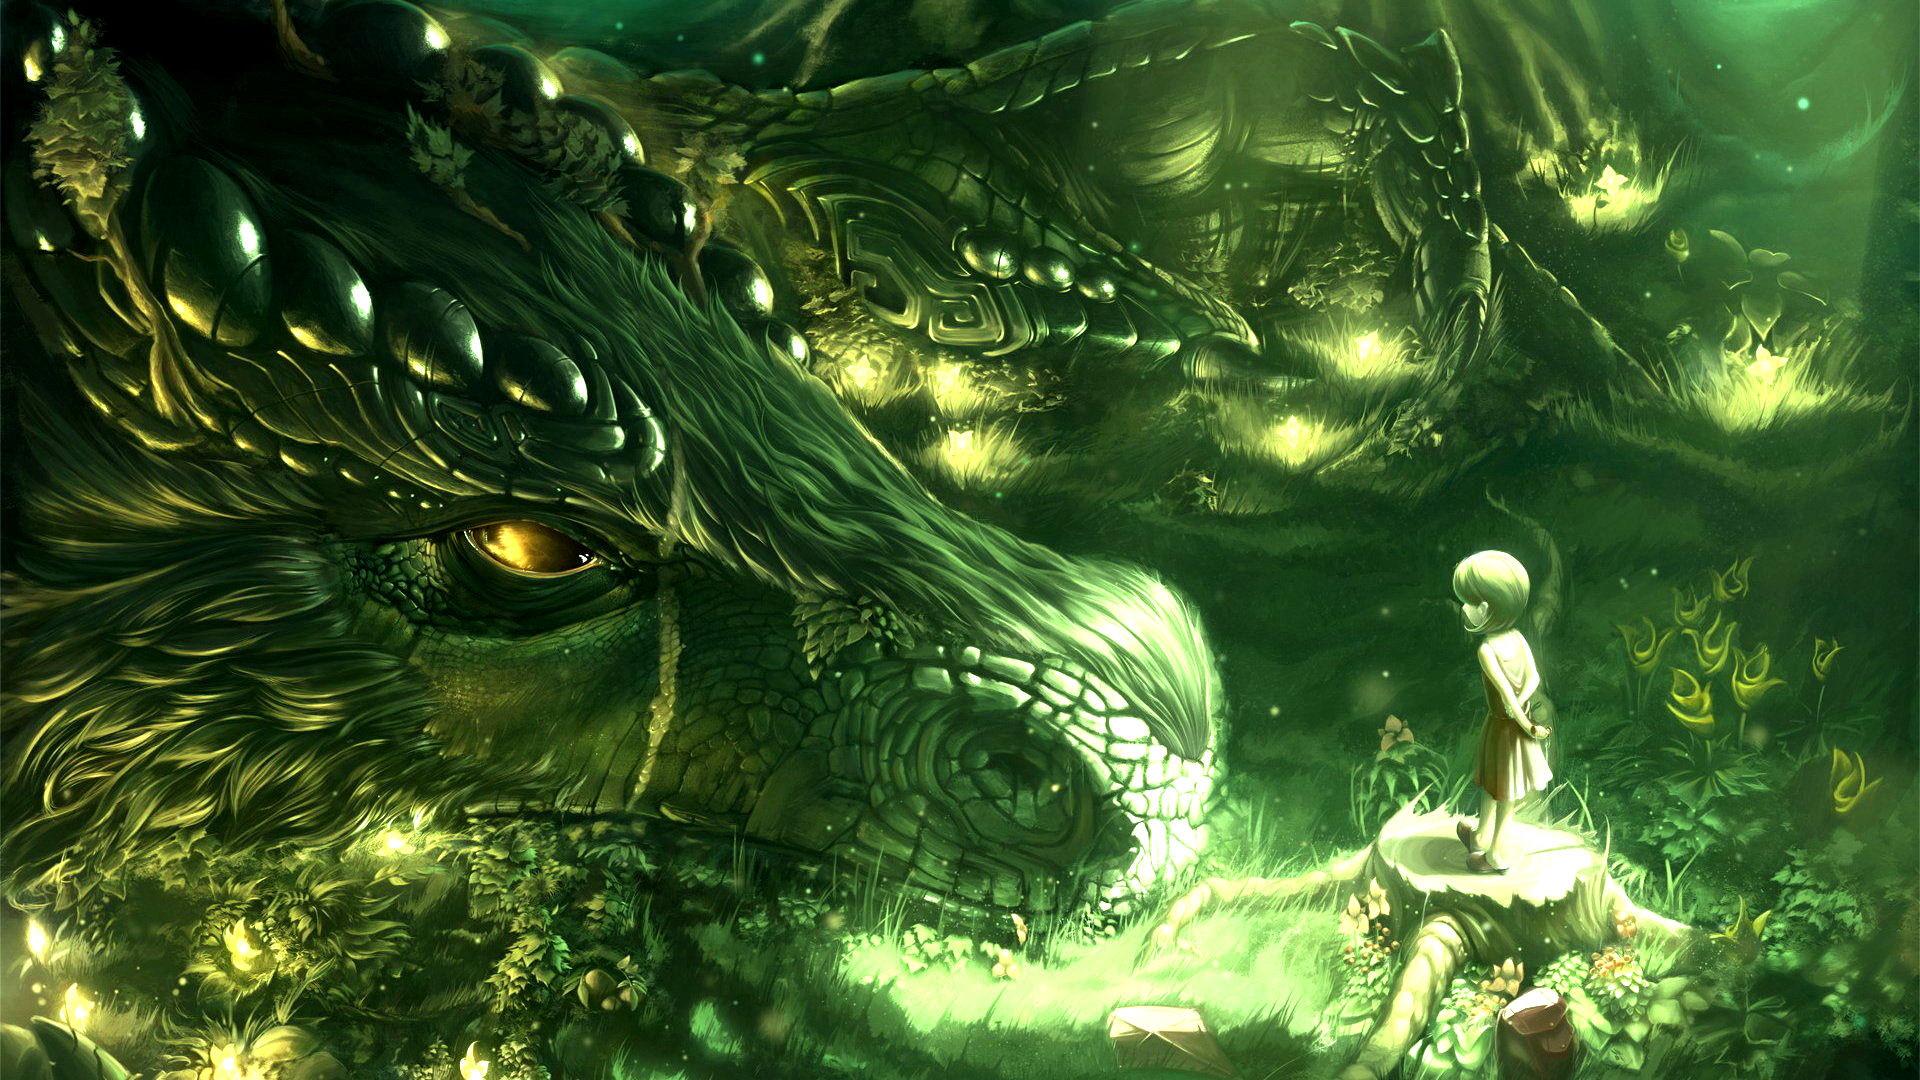 -Green-Trees-Dragons-Monsters-Forest-Kids-Fantasy-Art